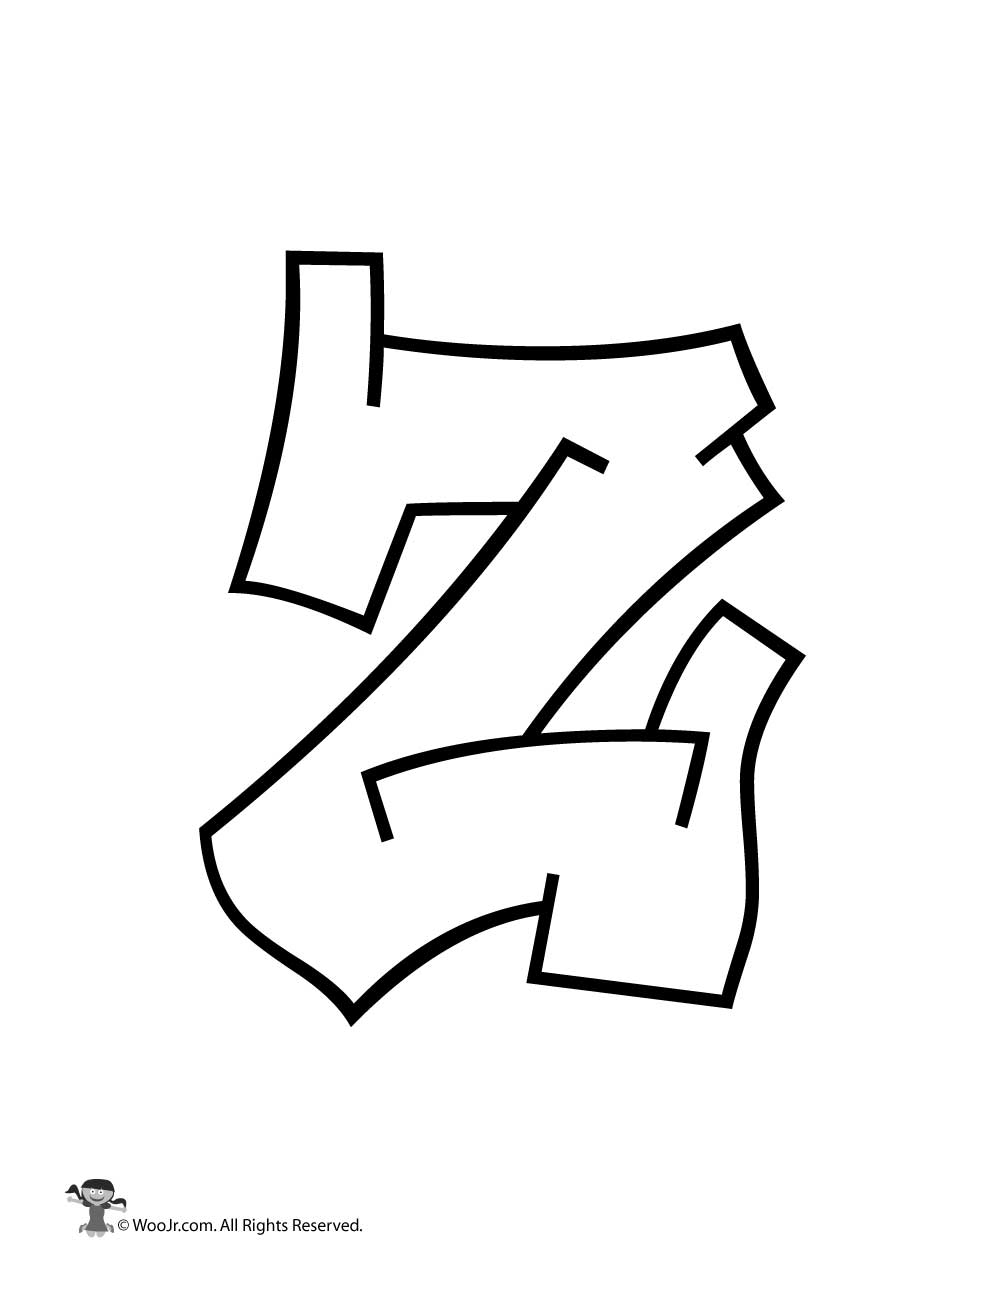 Graffiti capital letter z woo jr kids activities